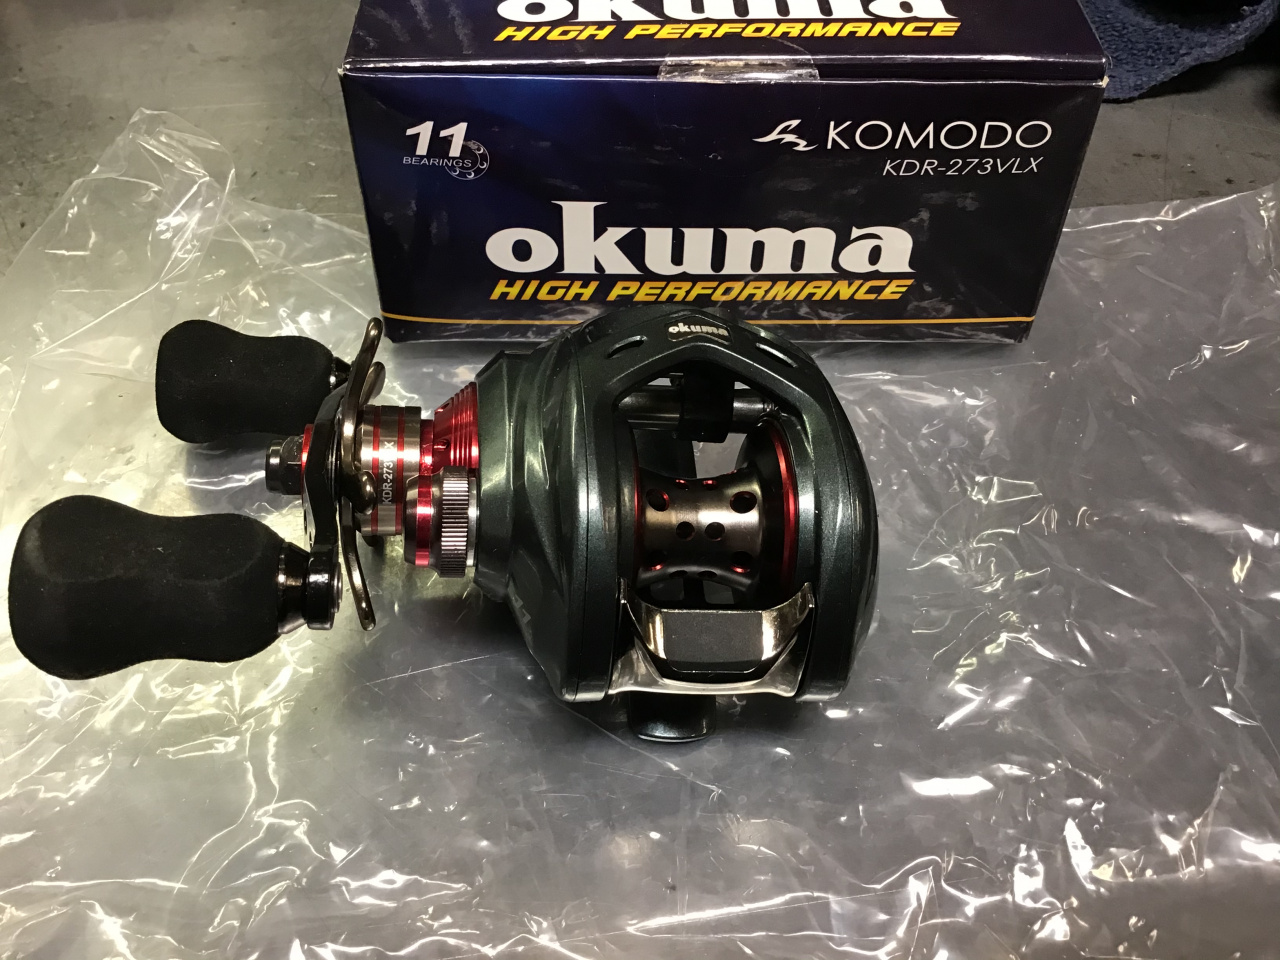 NIB Okuma Komodo-3f6a4067-54bd-478f-9e0f-e3ca7c6ee074-jpg